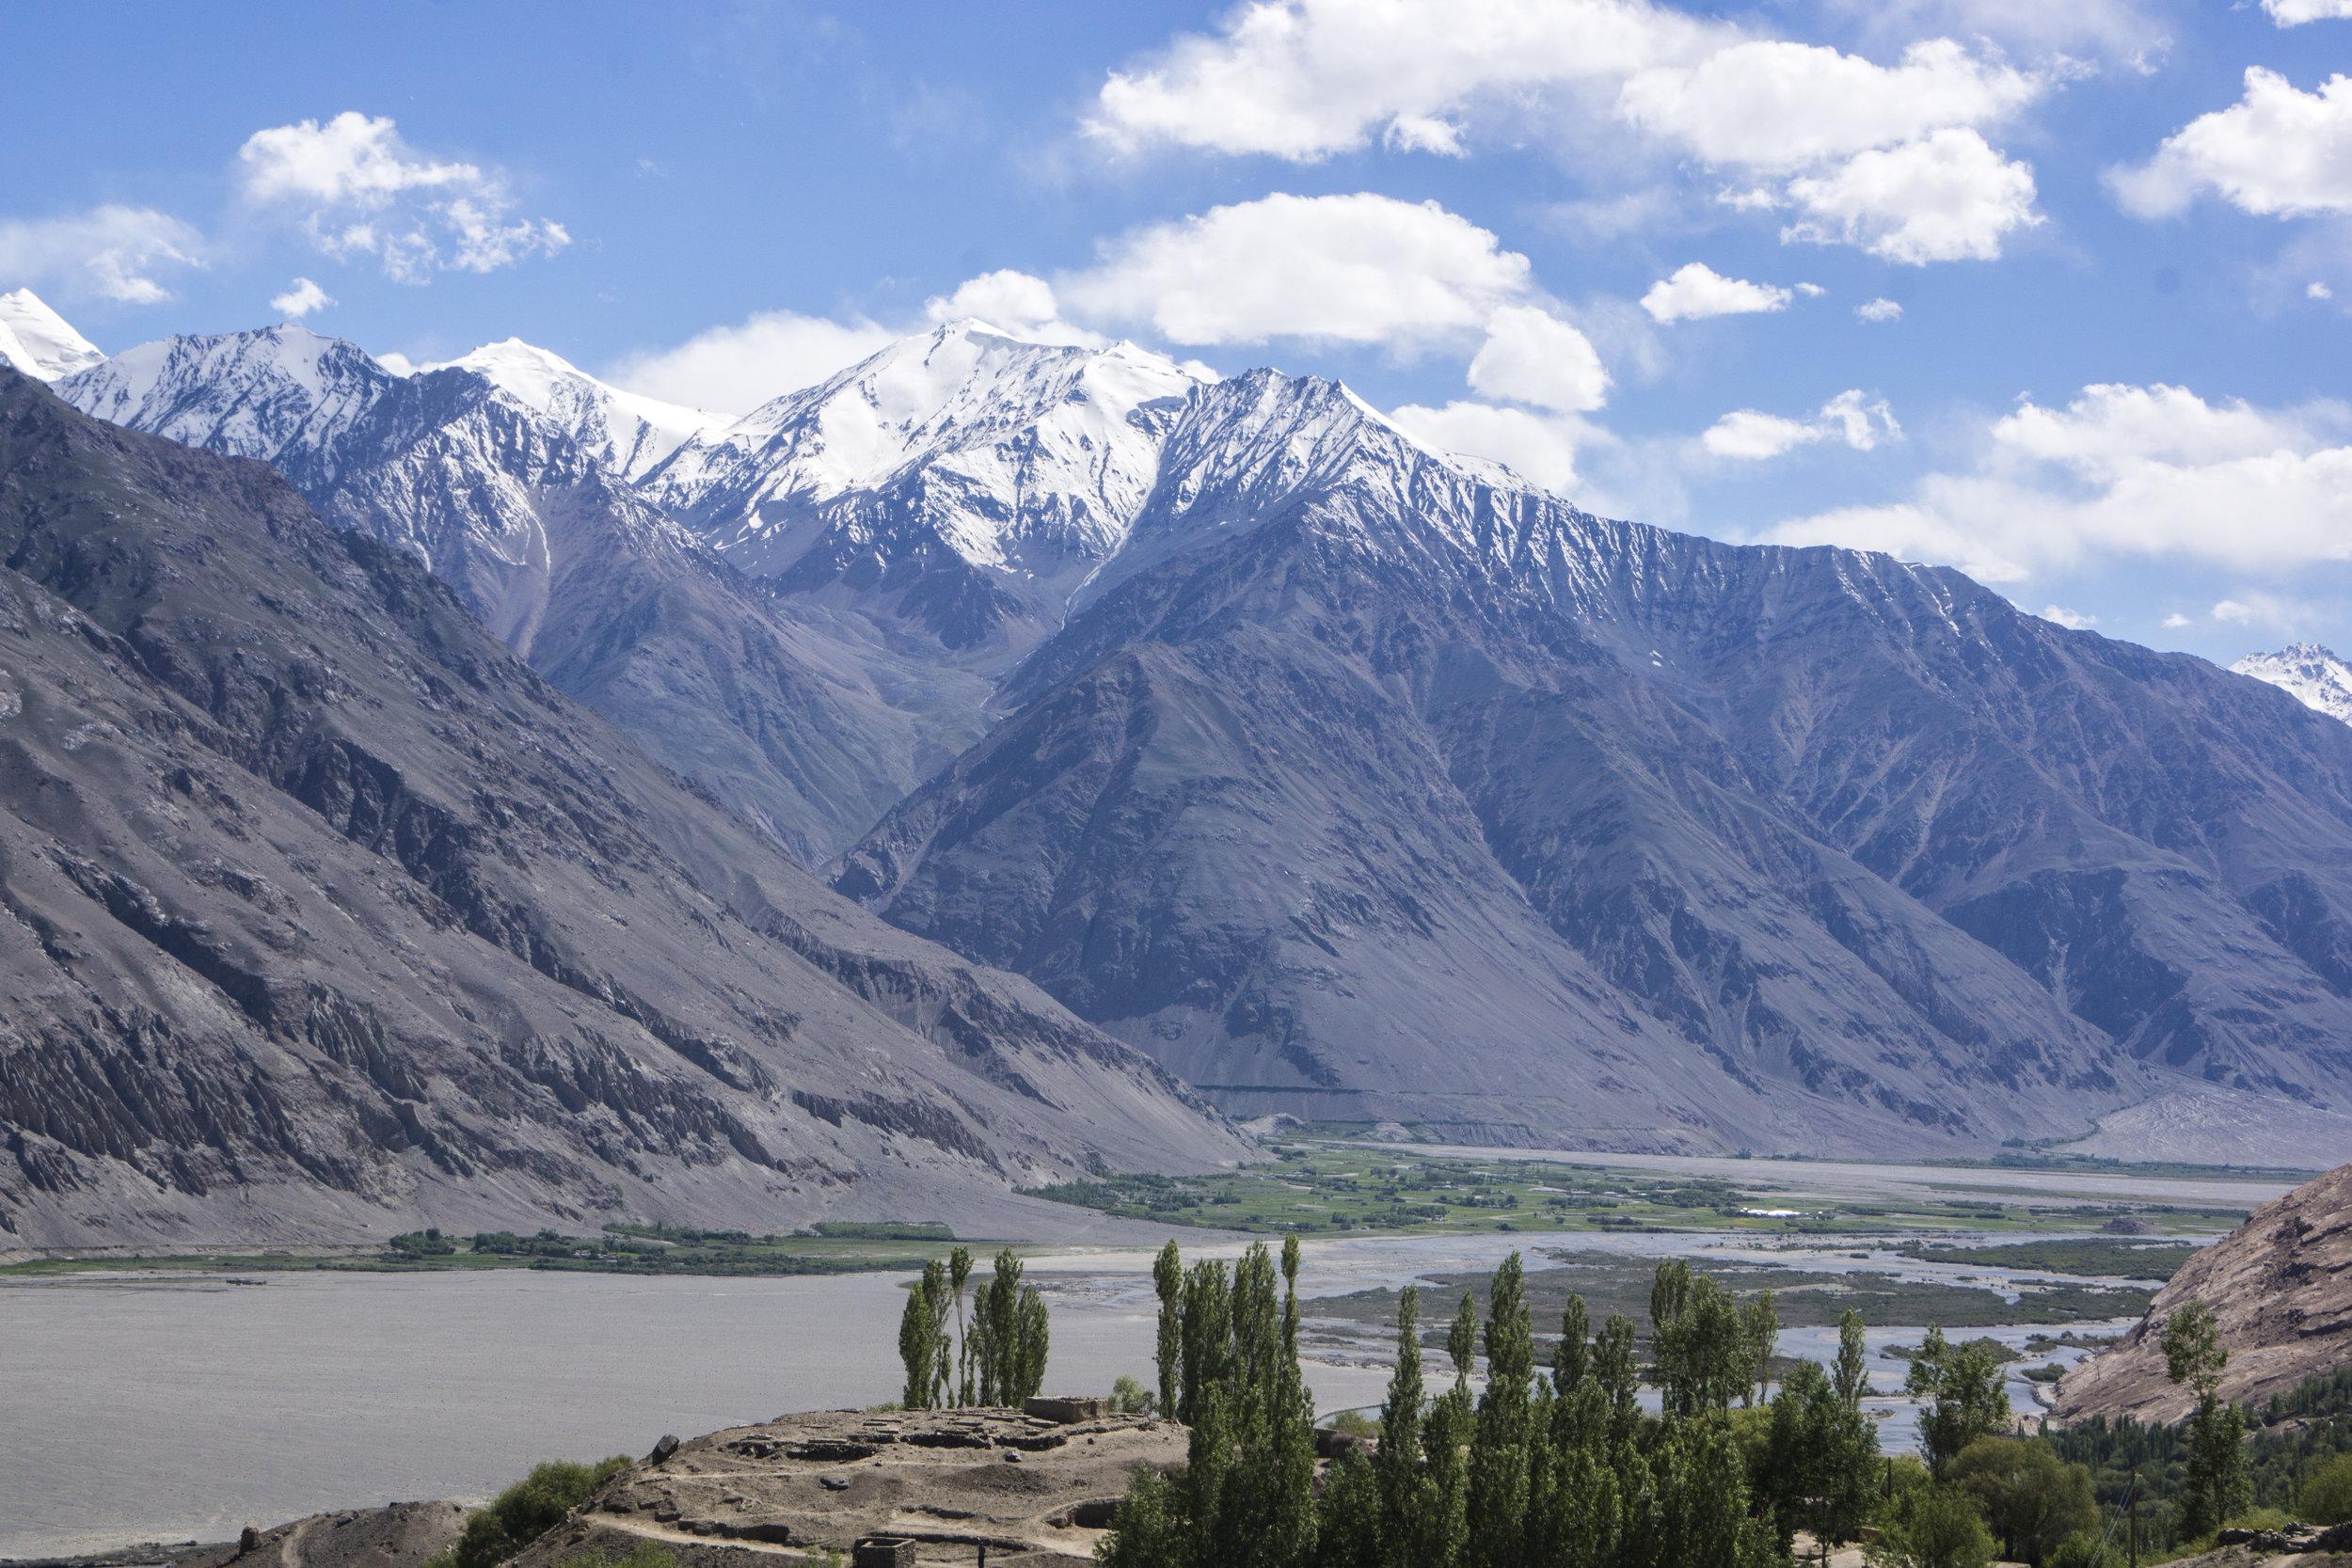 AfghanVillagefromAfar.jpg